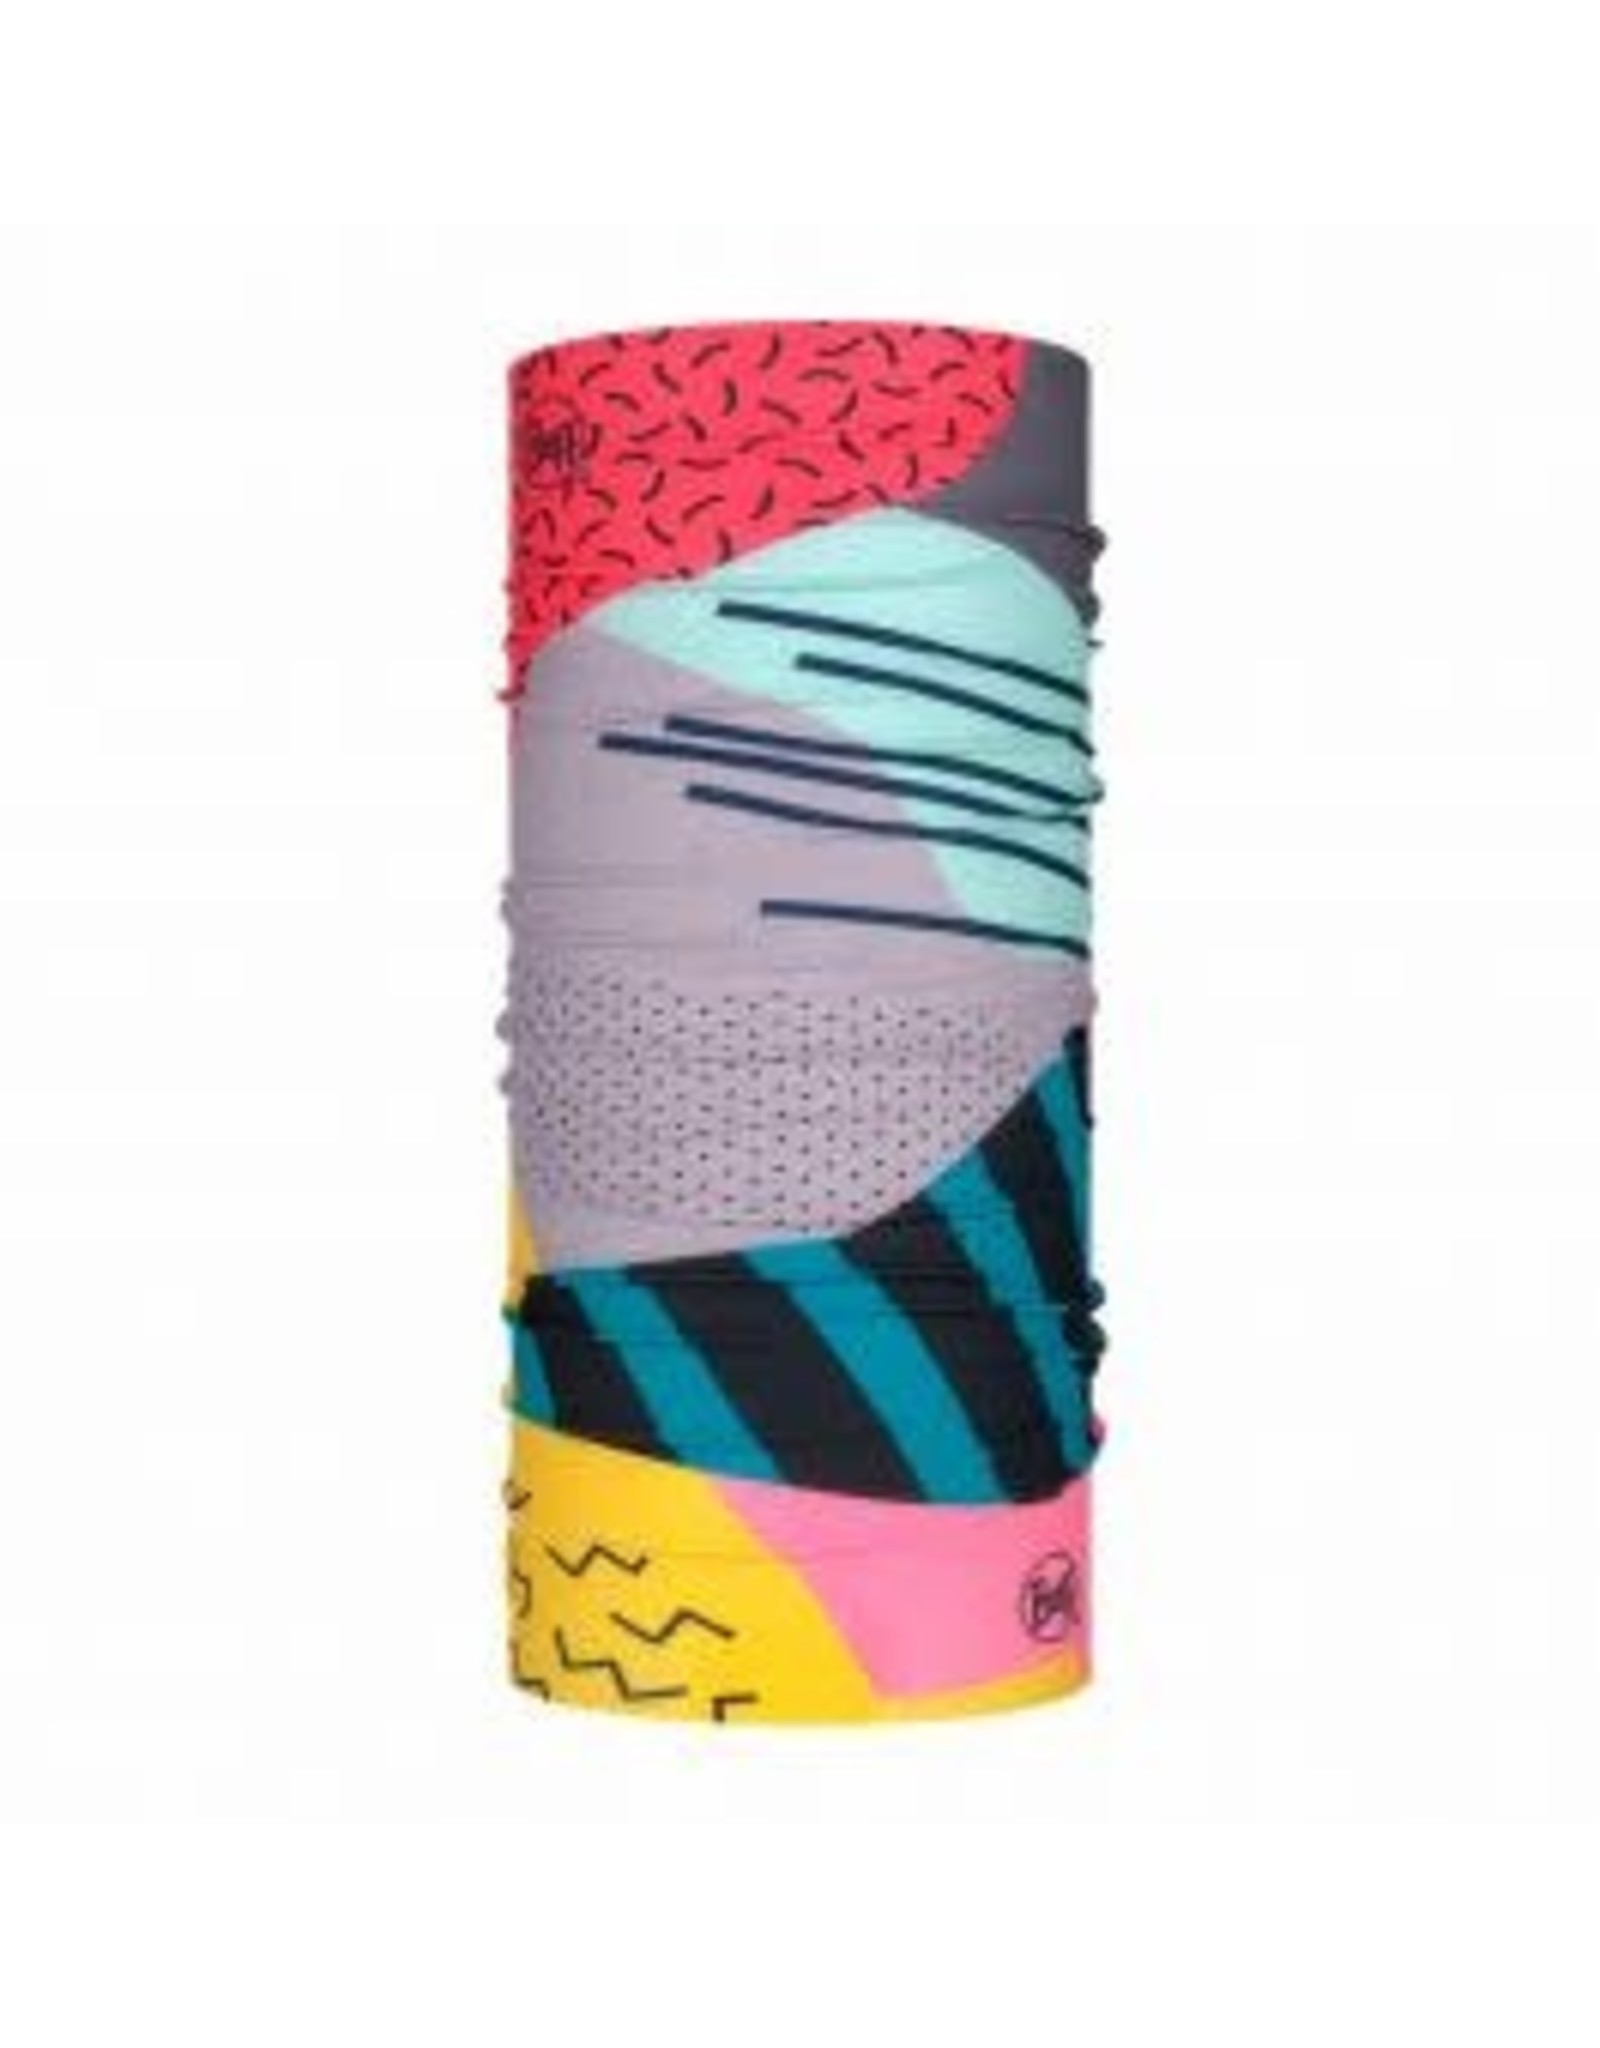 Buff '21, BUFF, Multifunctional Headwear, Original, Assorted Colours